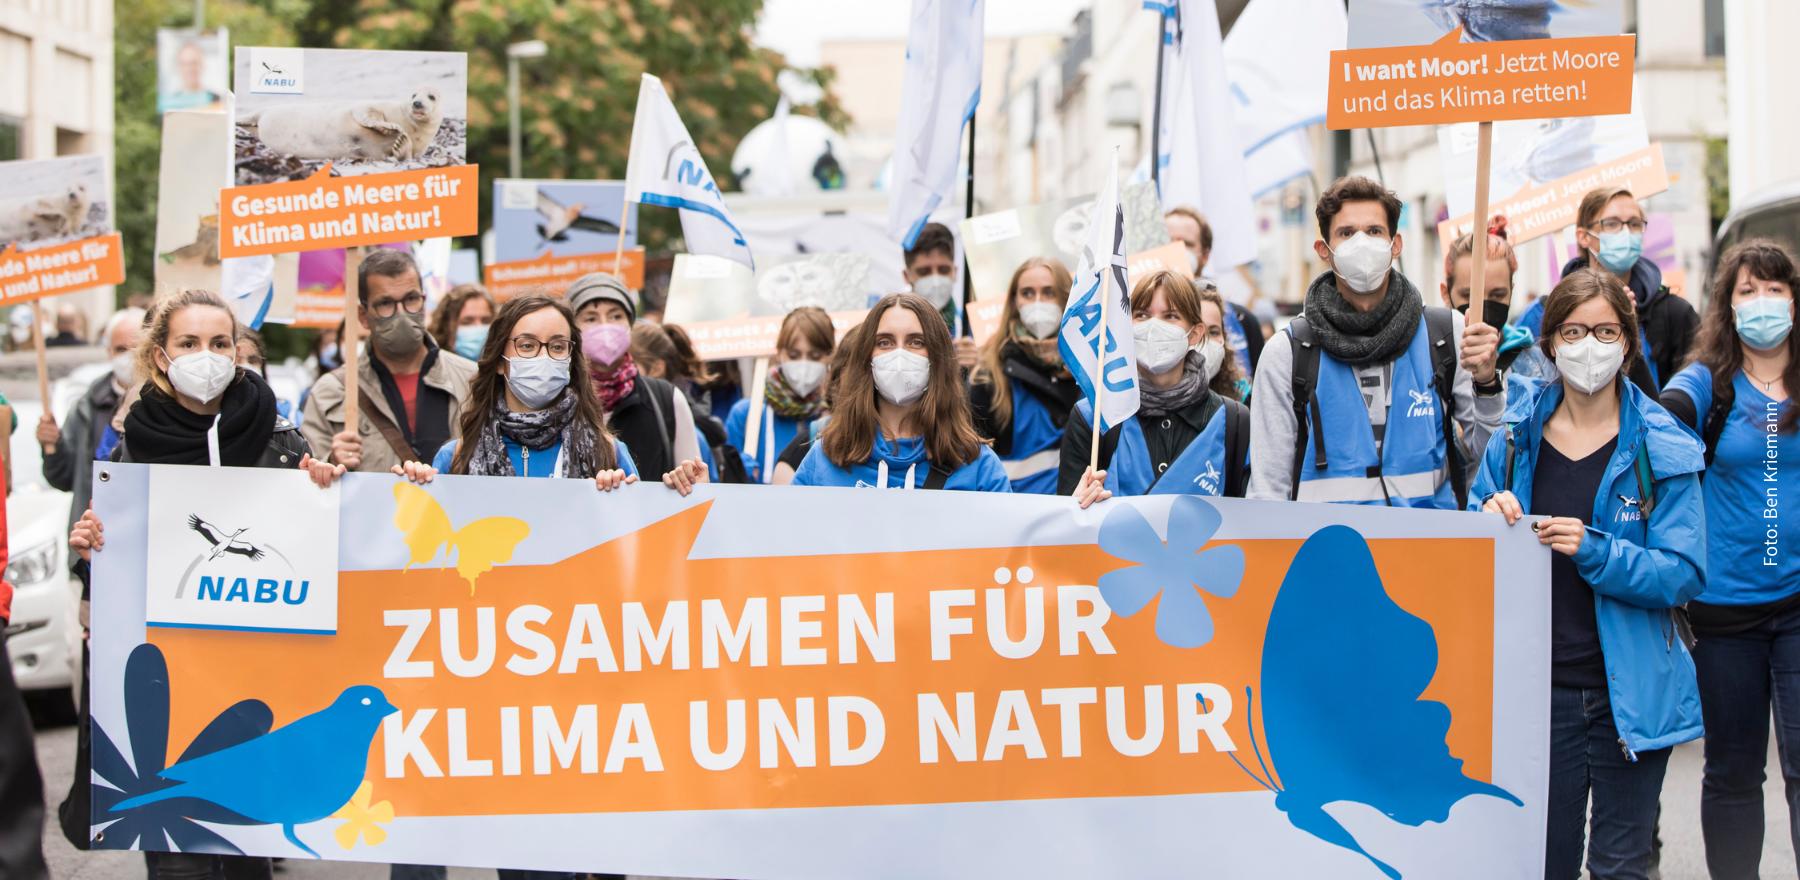 #Klimastreik in Berlin